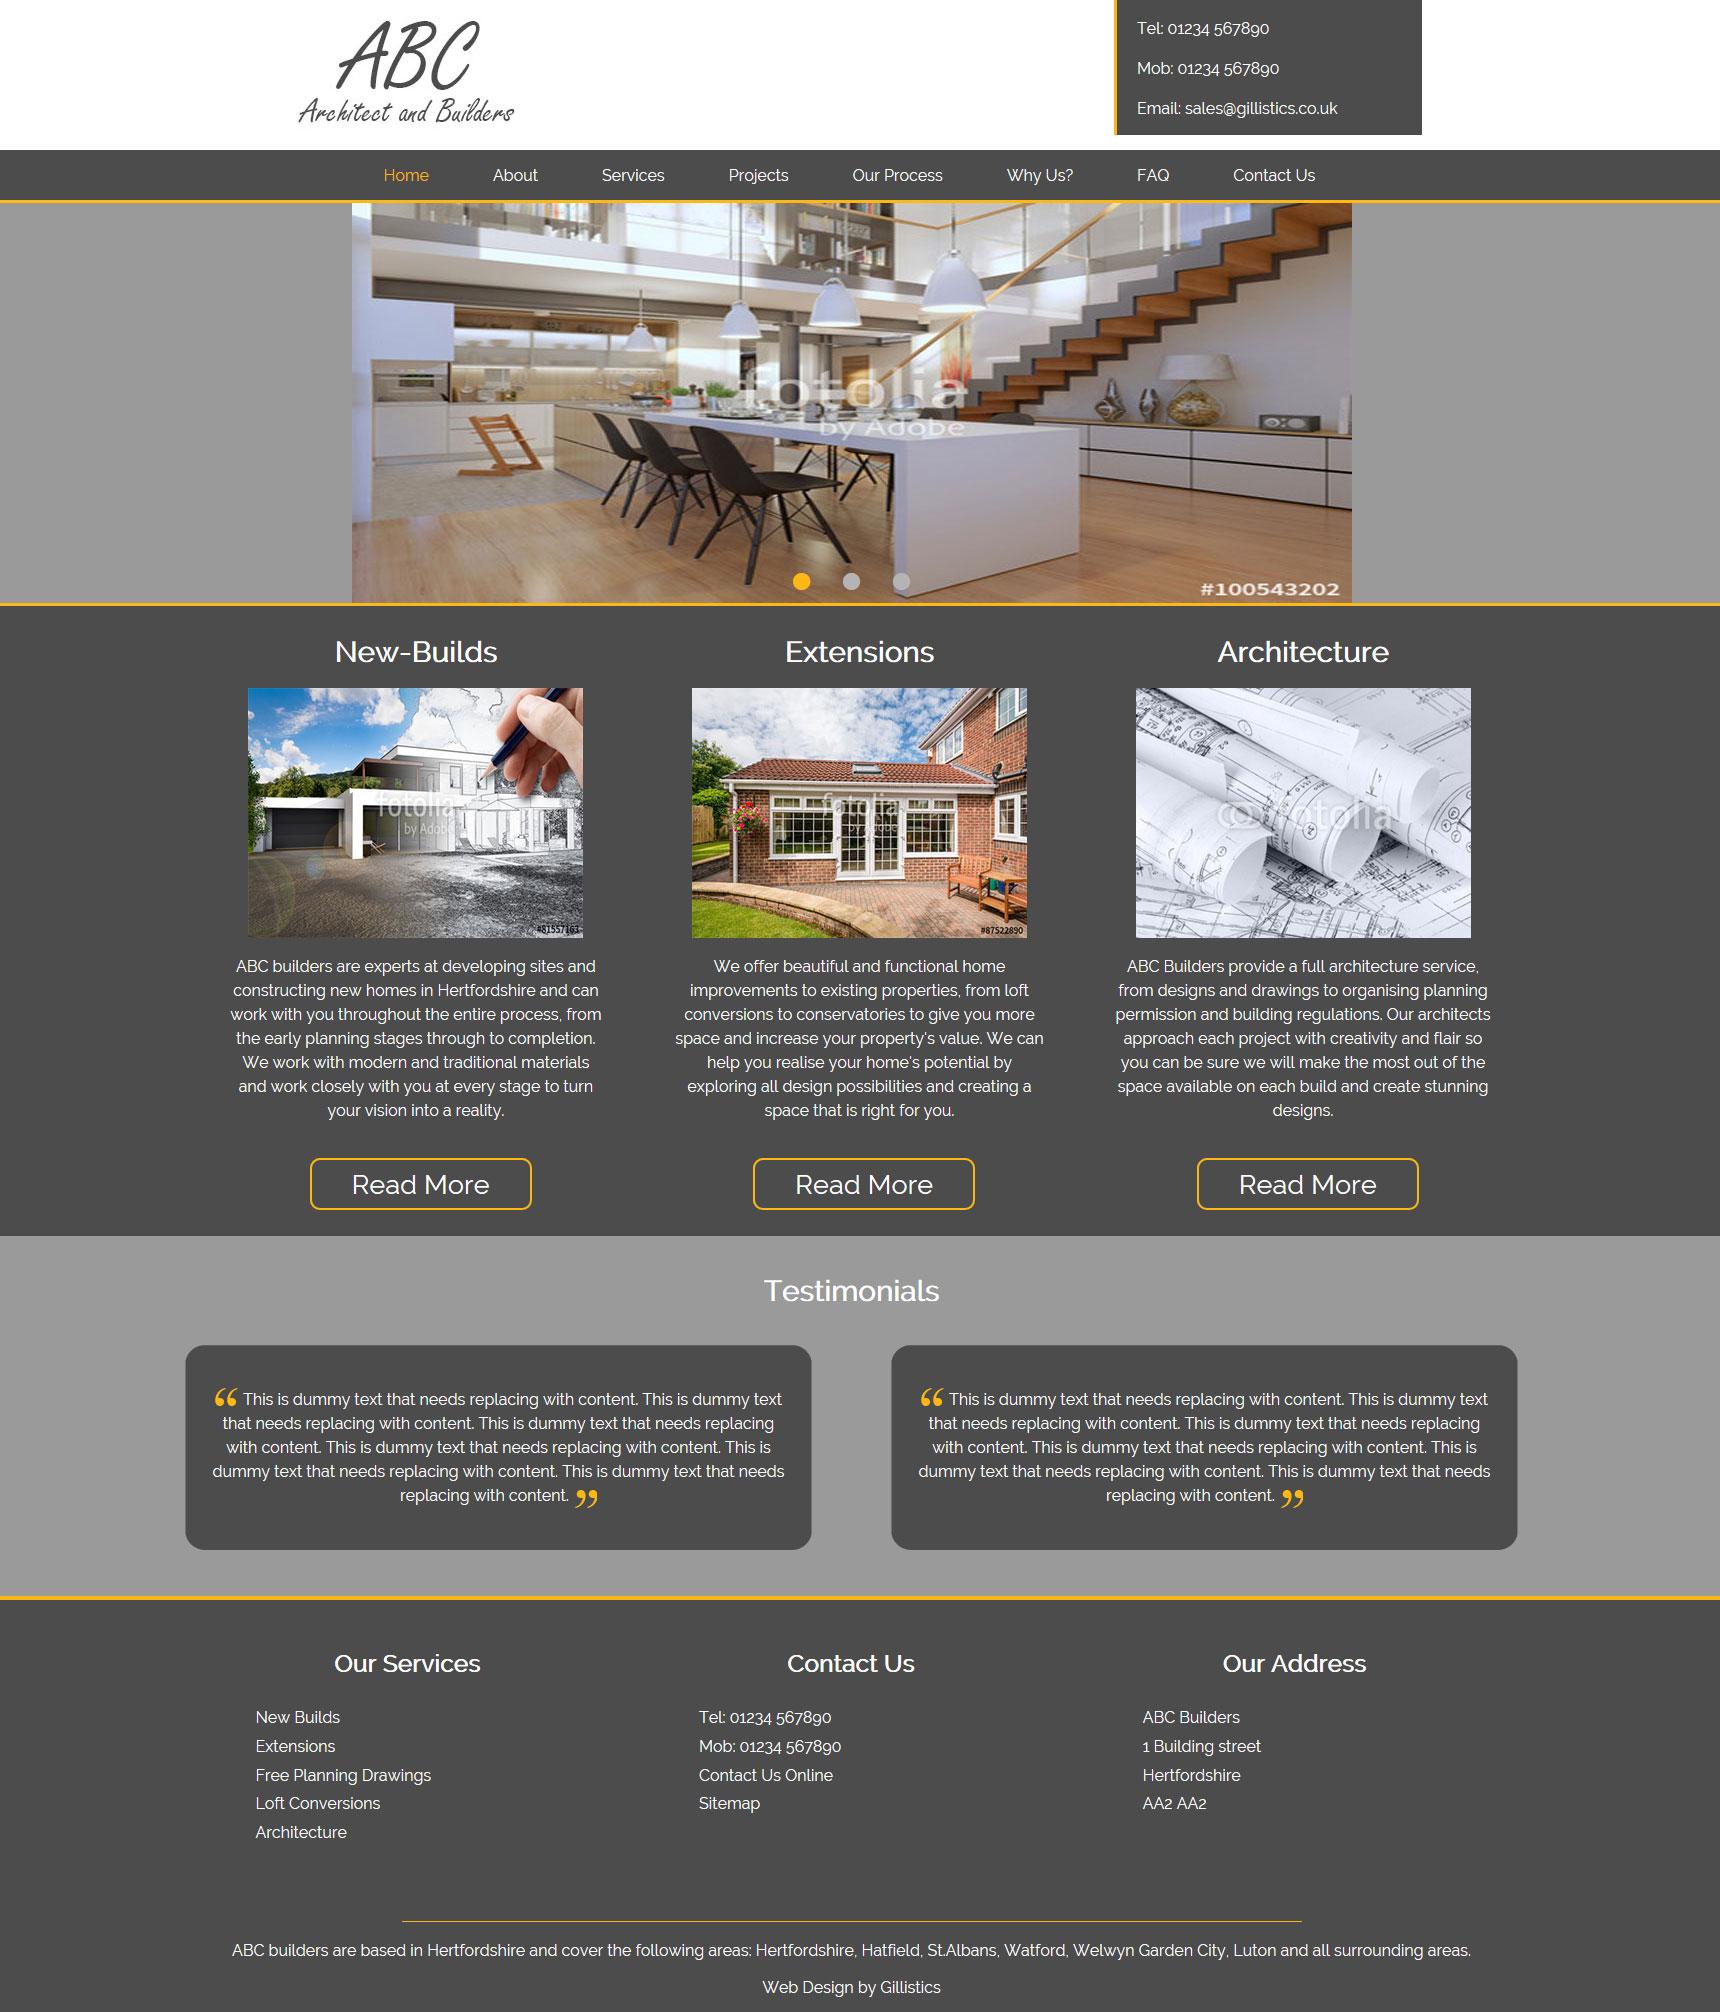 Portfolio Gillistics Abc Builders Bespoke Web Design In St Albans Hertfordshire